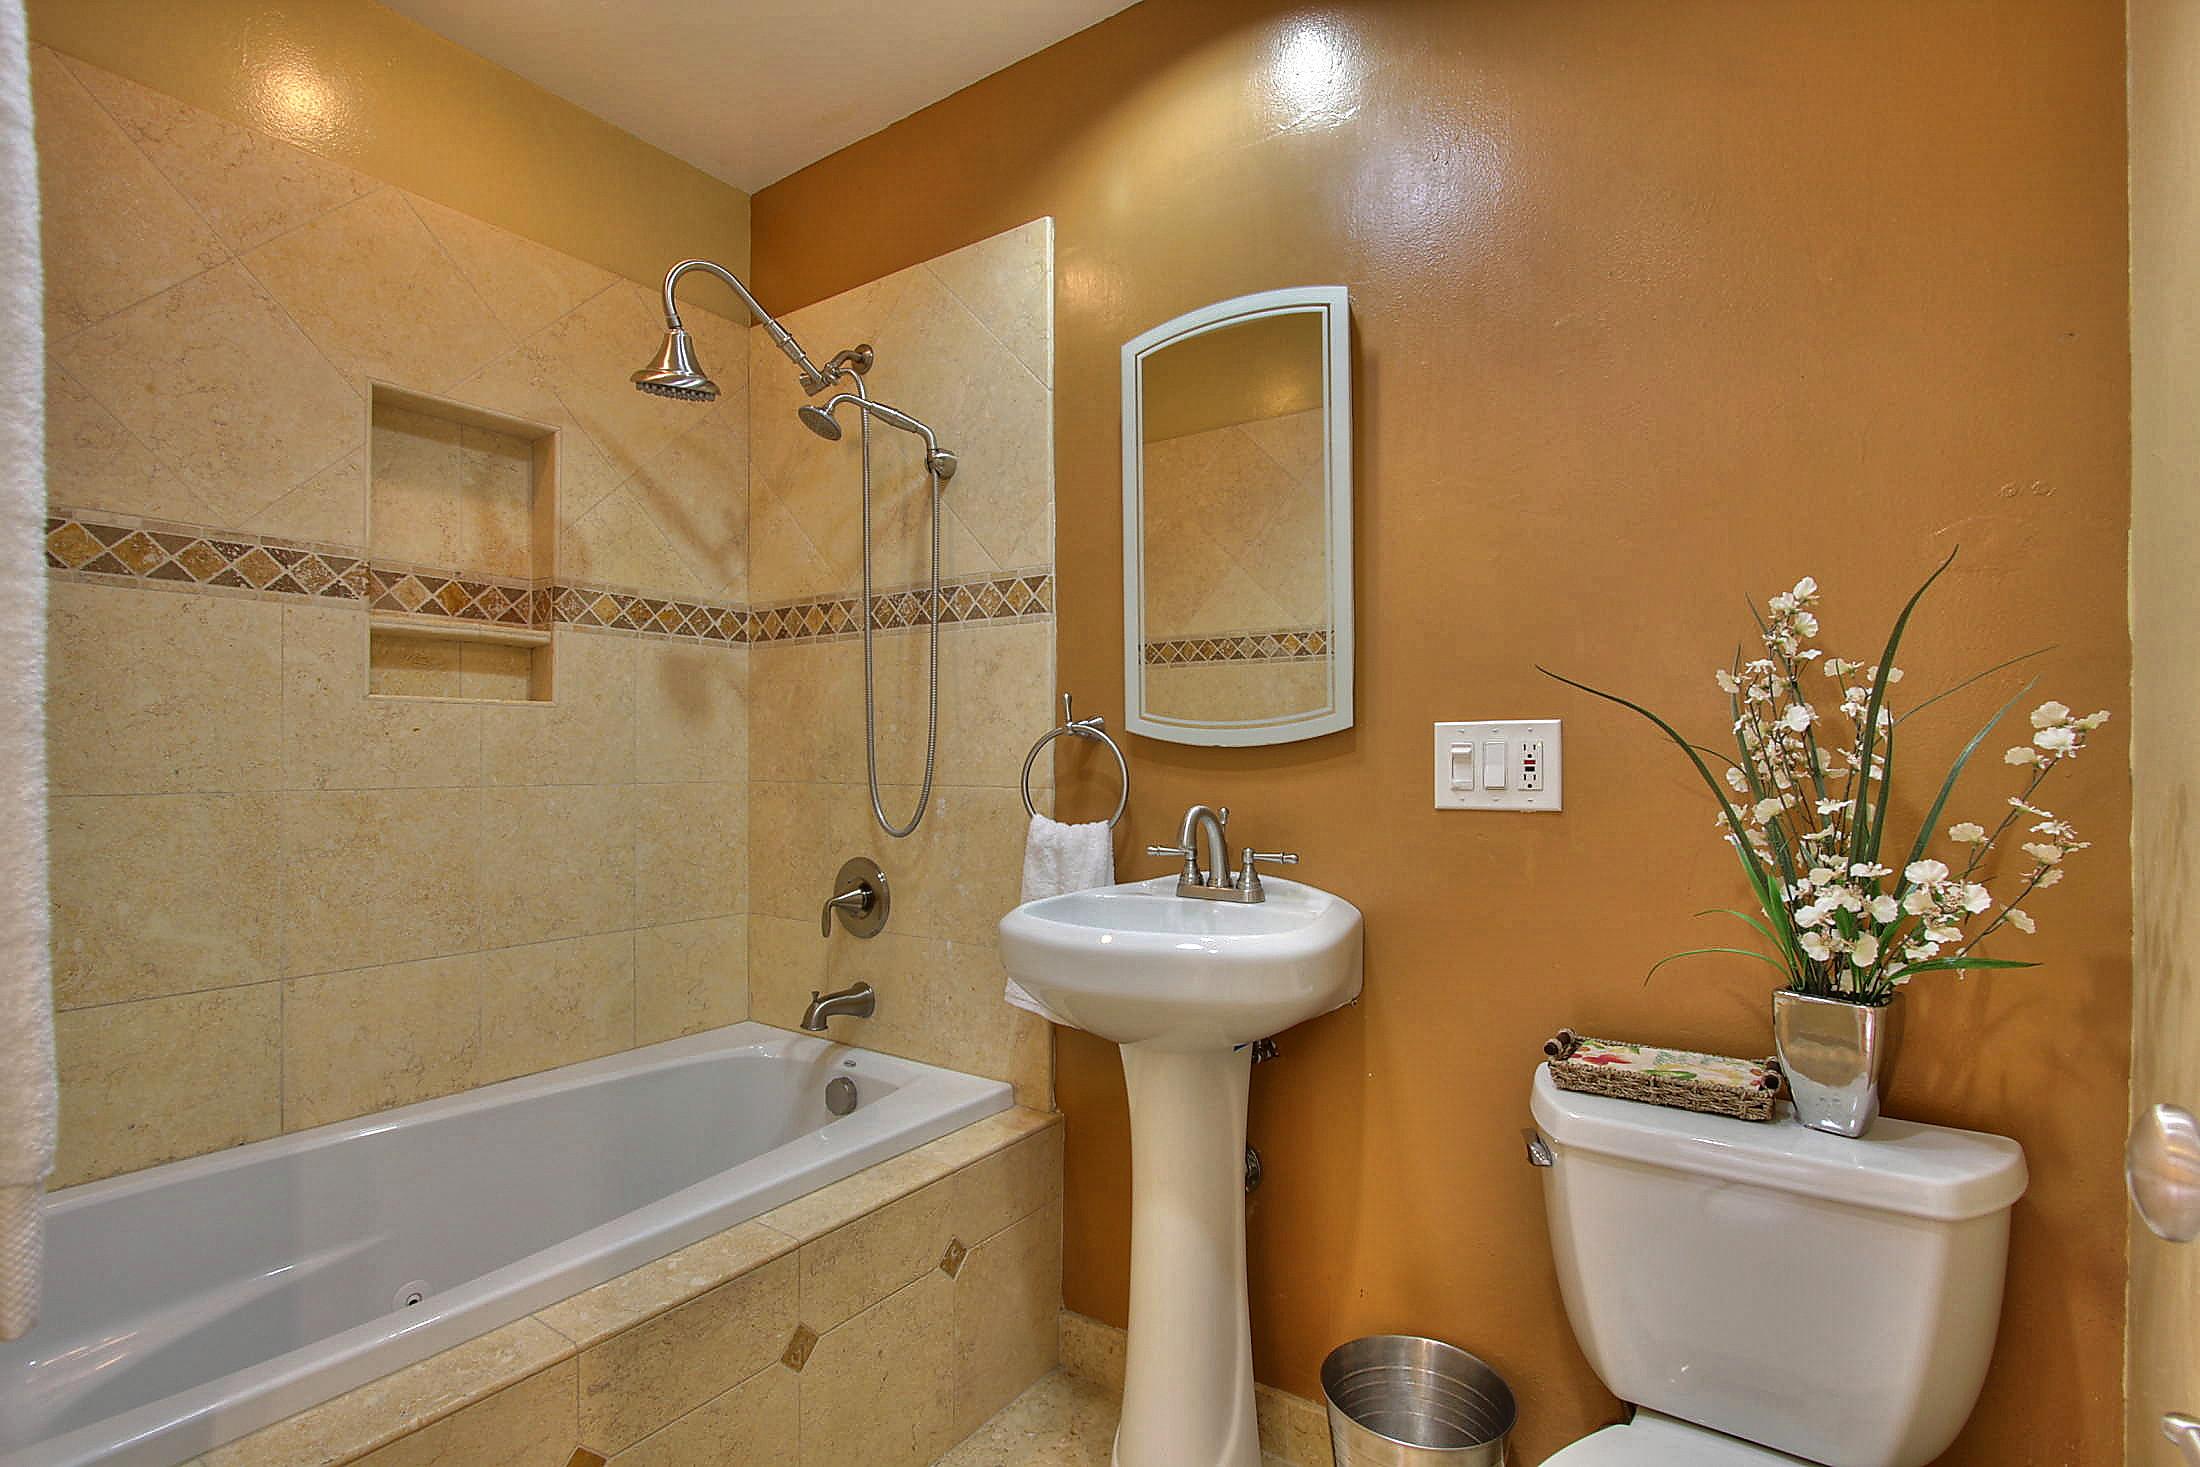 3 Bedroom Home For Sale On The Westside Of Santa Cruz